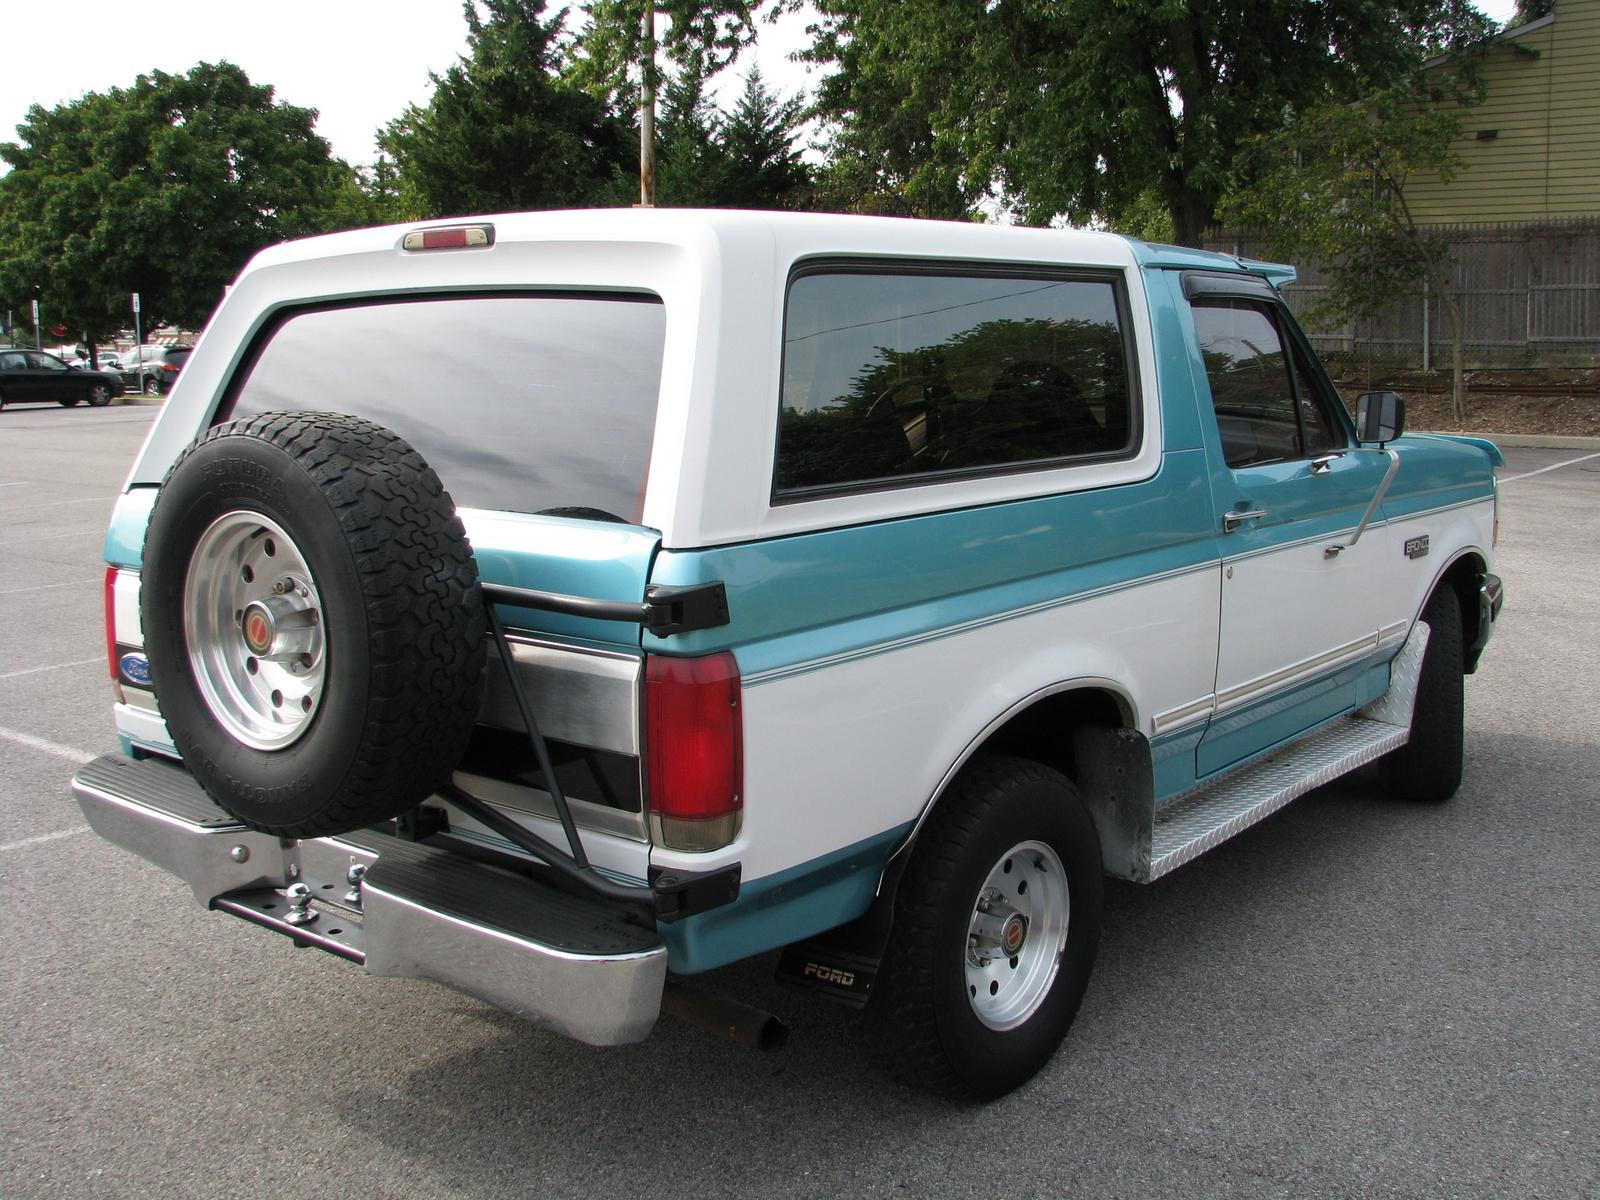 1994 Ford Bronco Xlt Reviews